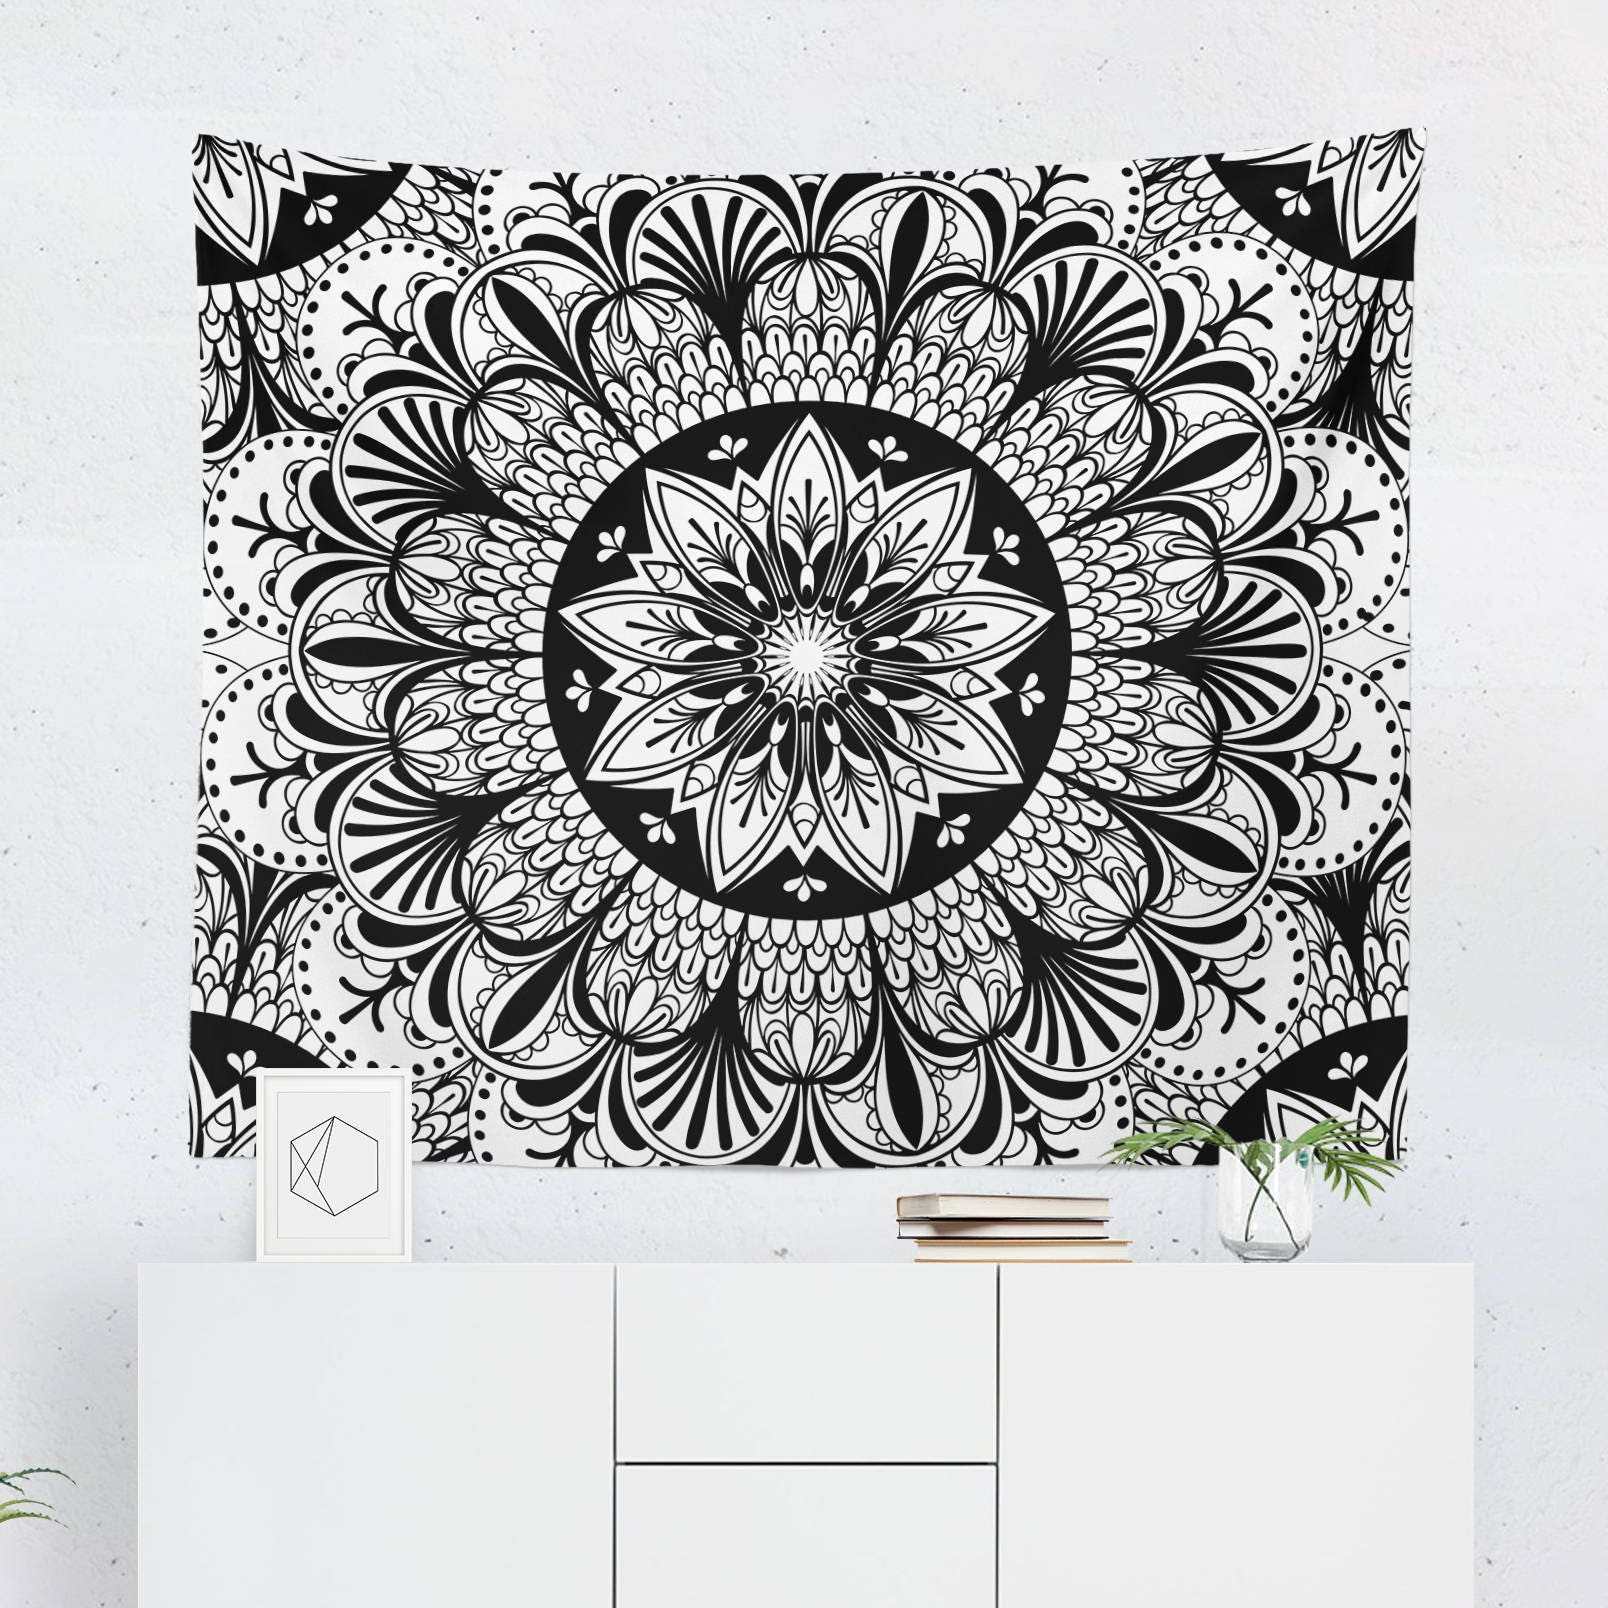 tapisserie noir et blanc tapisserie murale noir et blanc. Black Bedroom Furniture Sets. Home Design Ideas